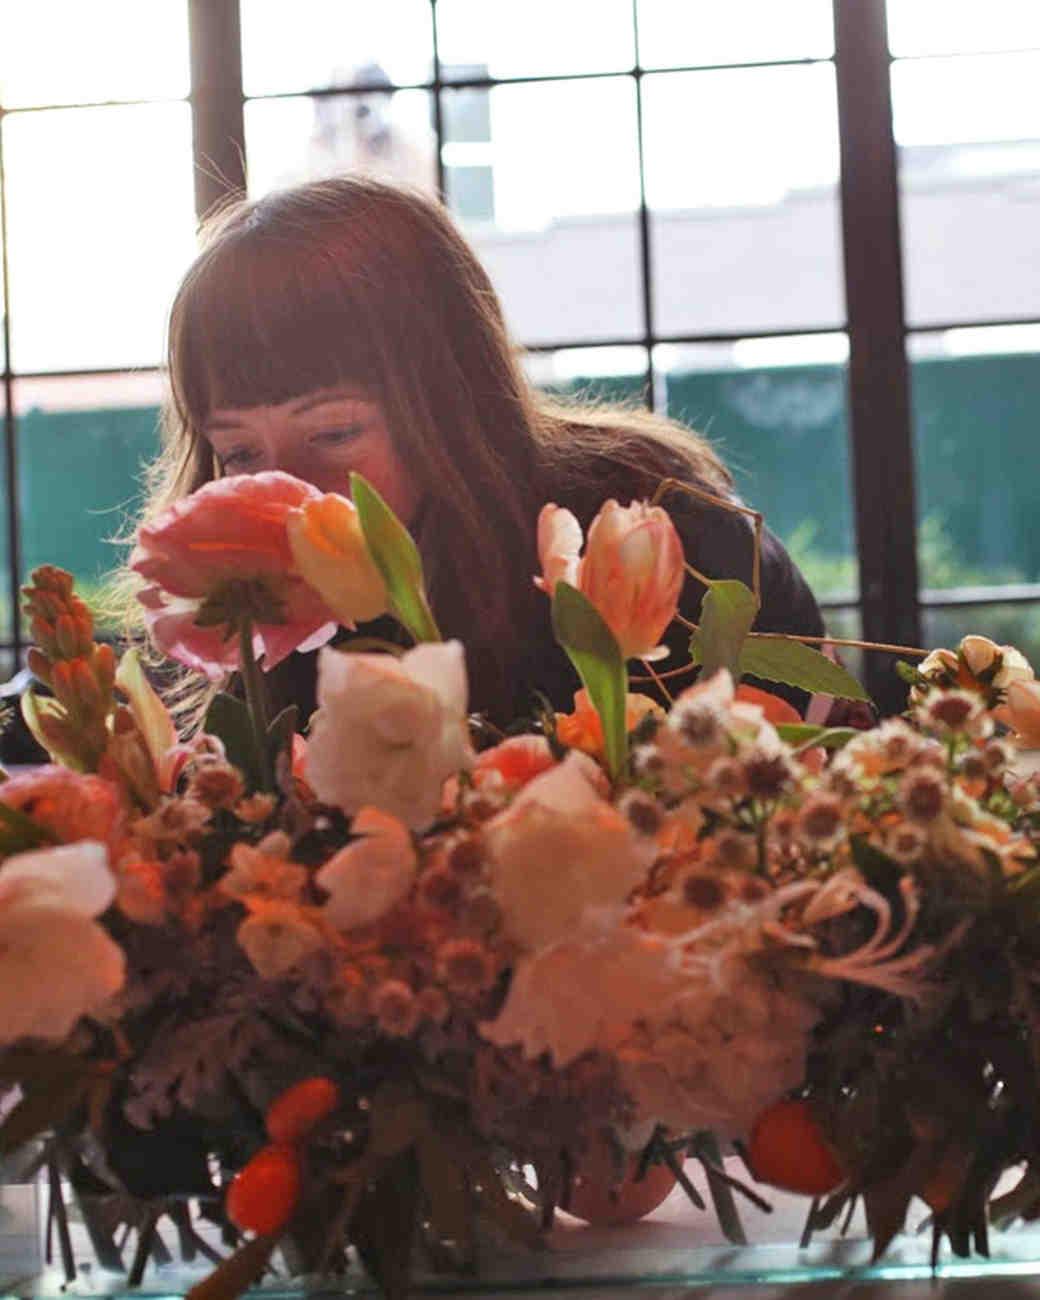 farmer-florists-sarah-ryhanen-saipua-1214.jpg